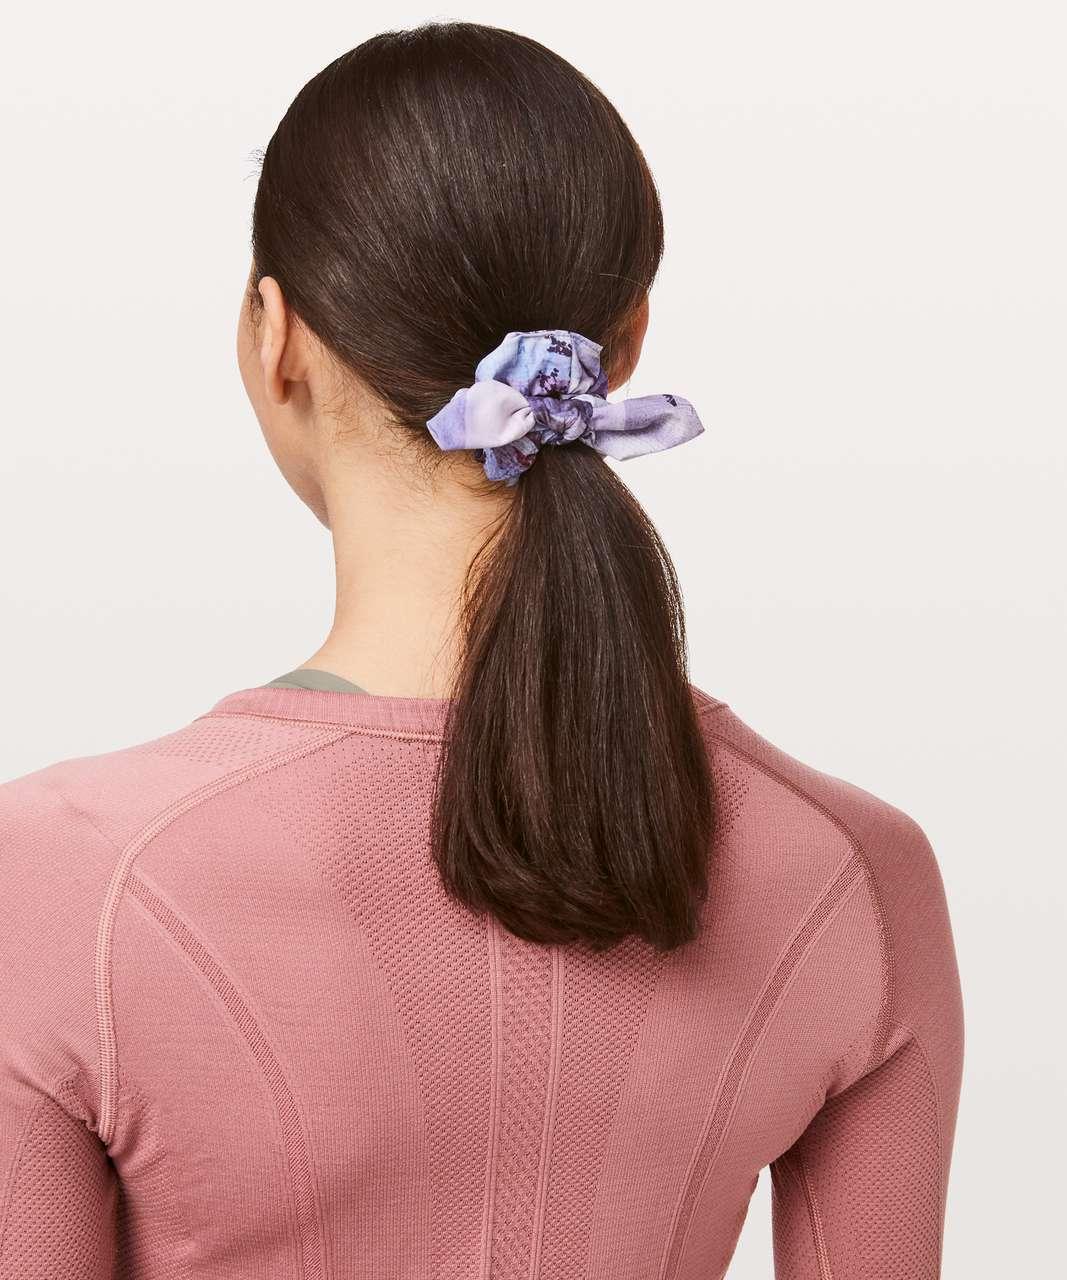 Lululemon Uplifting Scrunchie *Bow - Sunrise Silhouette Multi